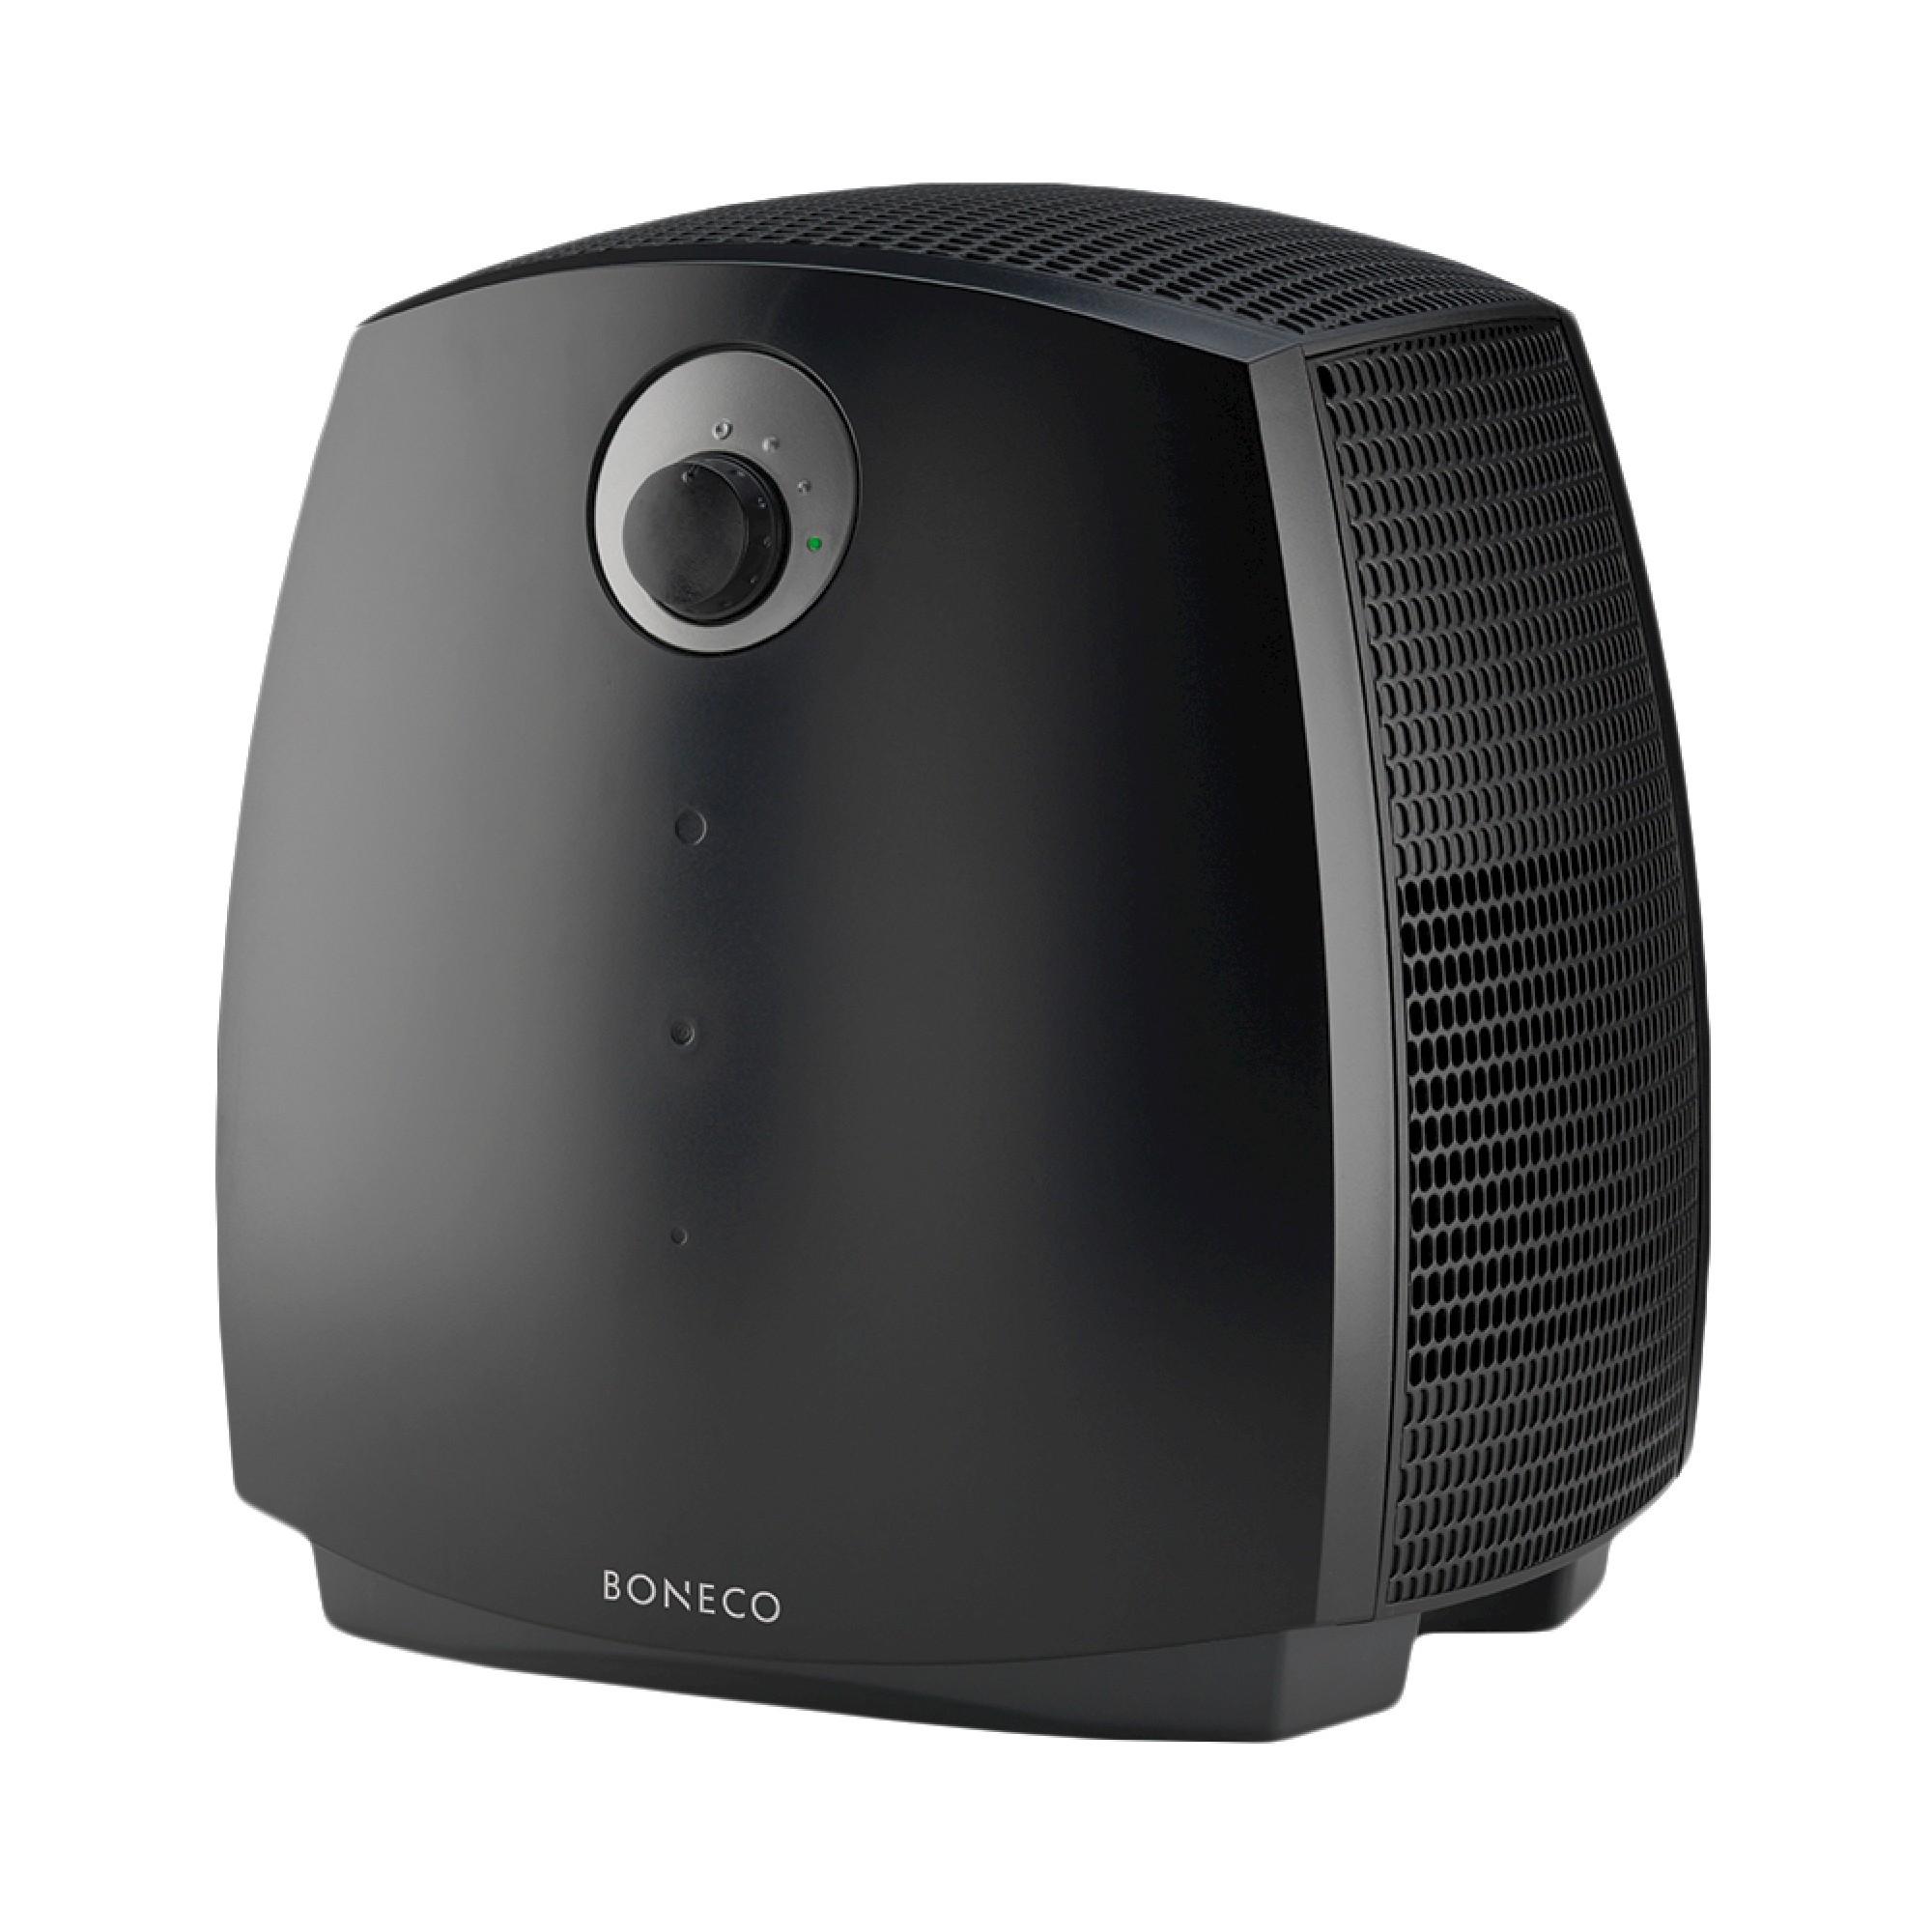 BONECO 2055A Air Washer Humidifier Heating and air